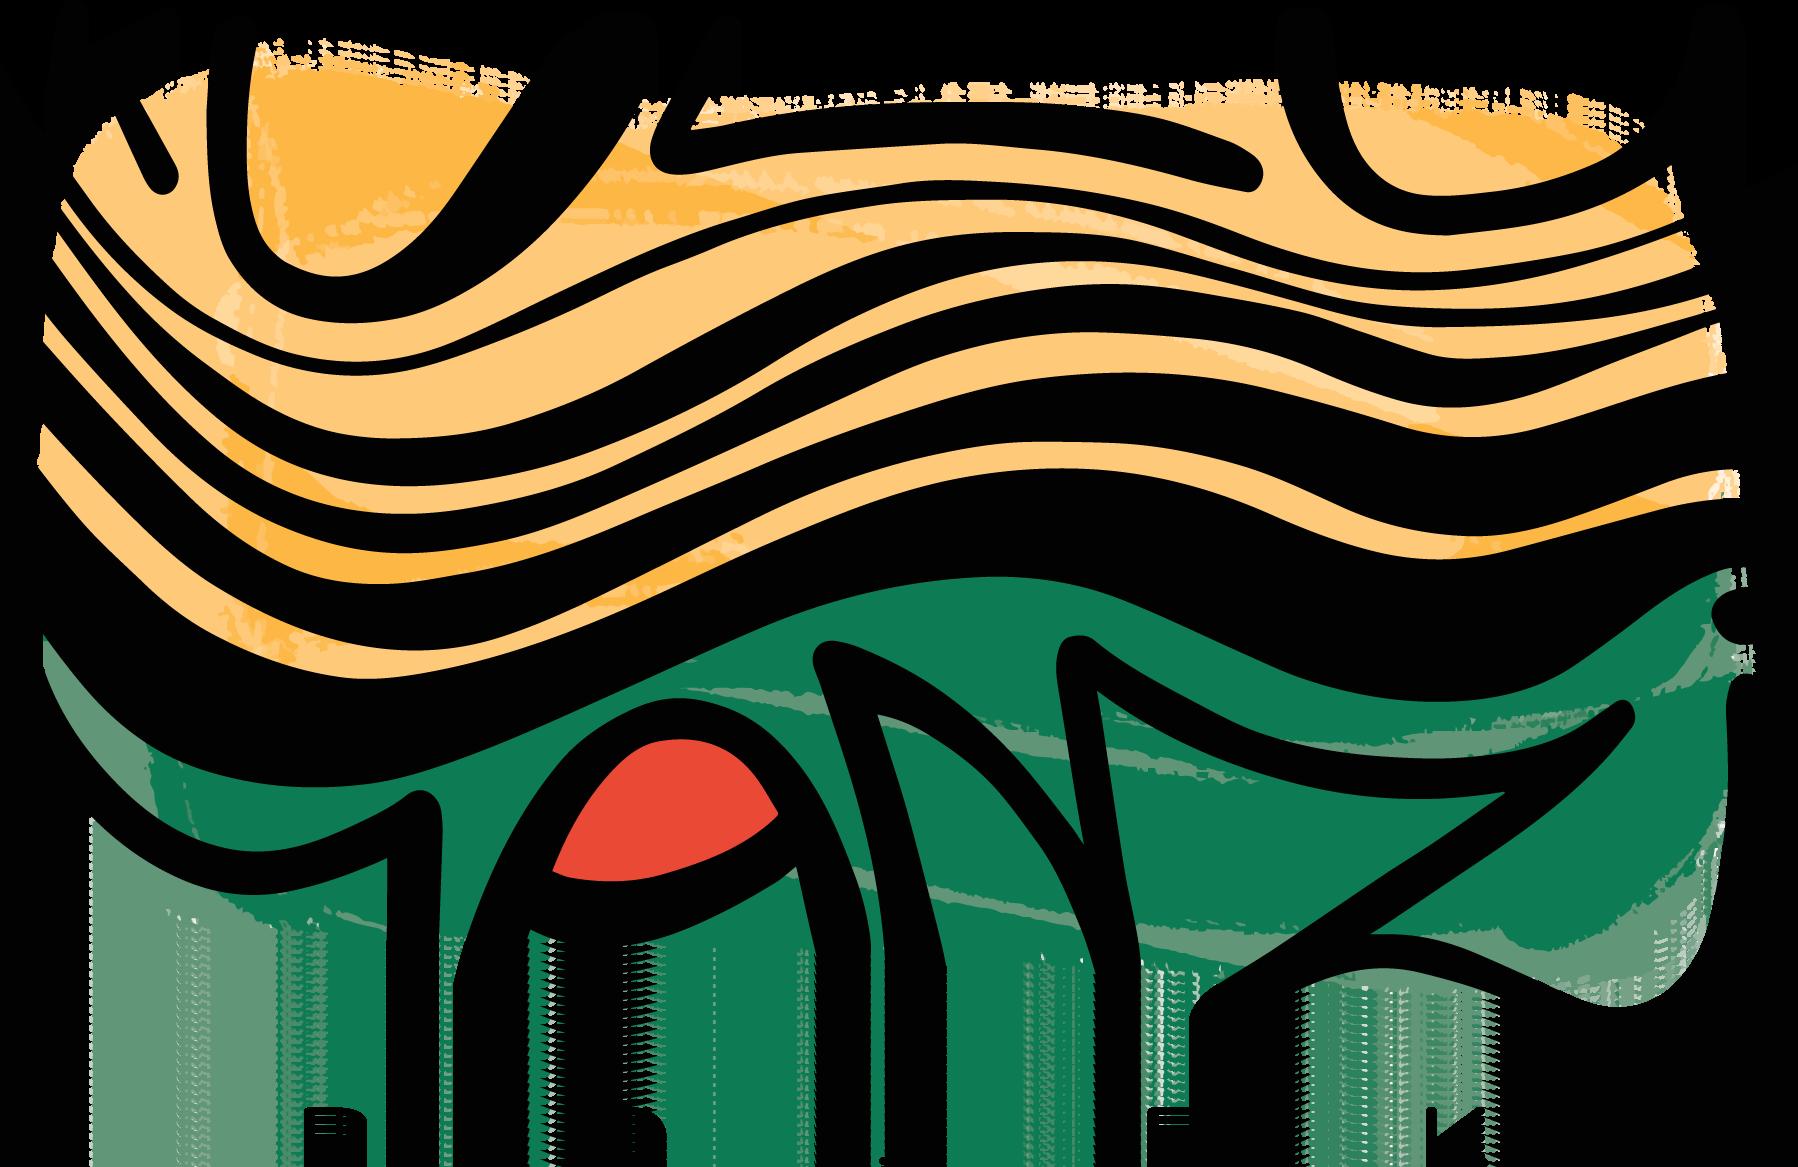 kulu manzi logo südafrika kapstadt soziales projekt unterstützung